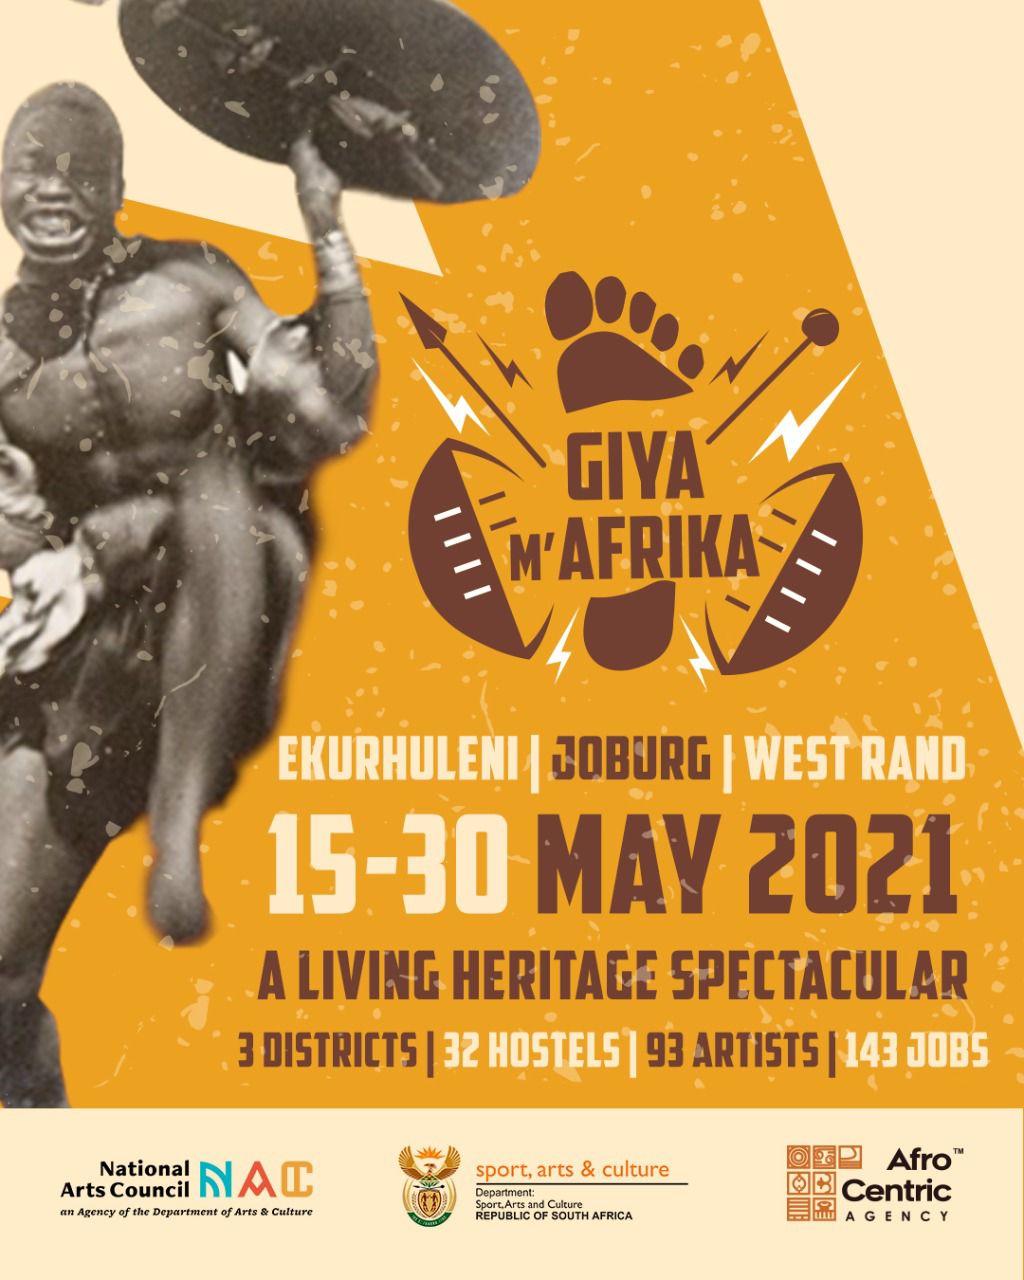 Giya m'Afrika – A living heritage spectacular